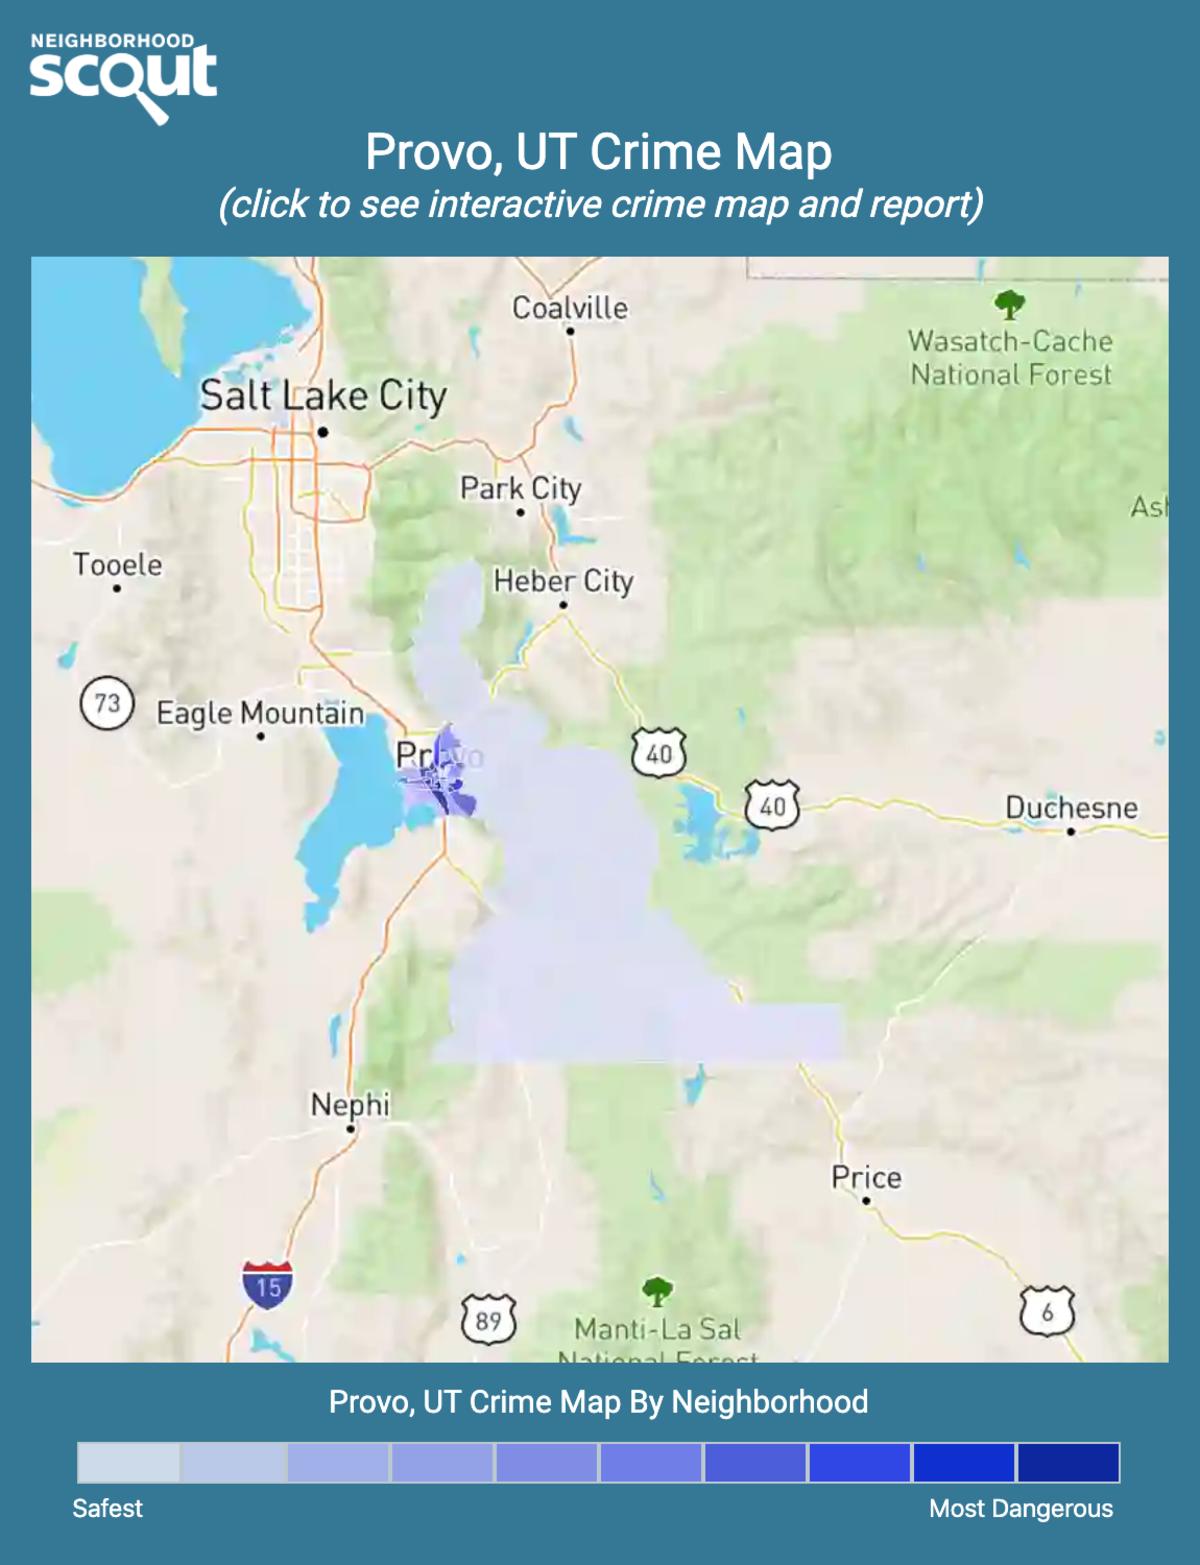 Provo, Utah crime map